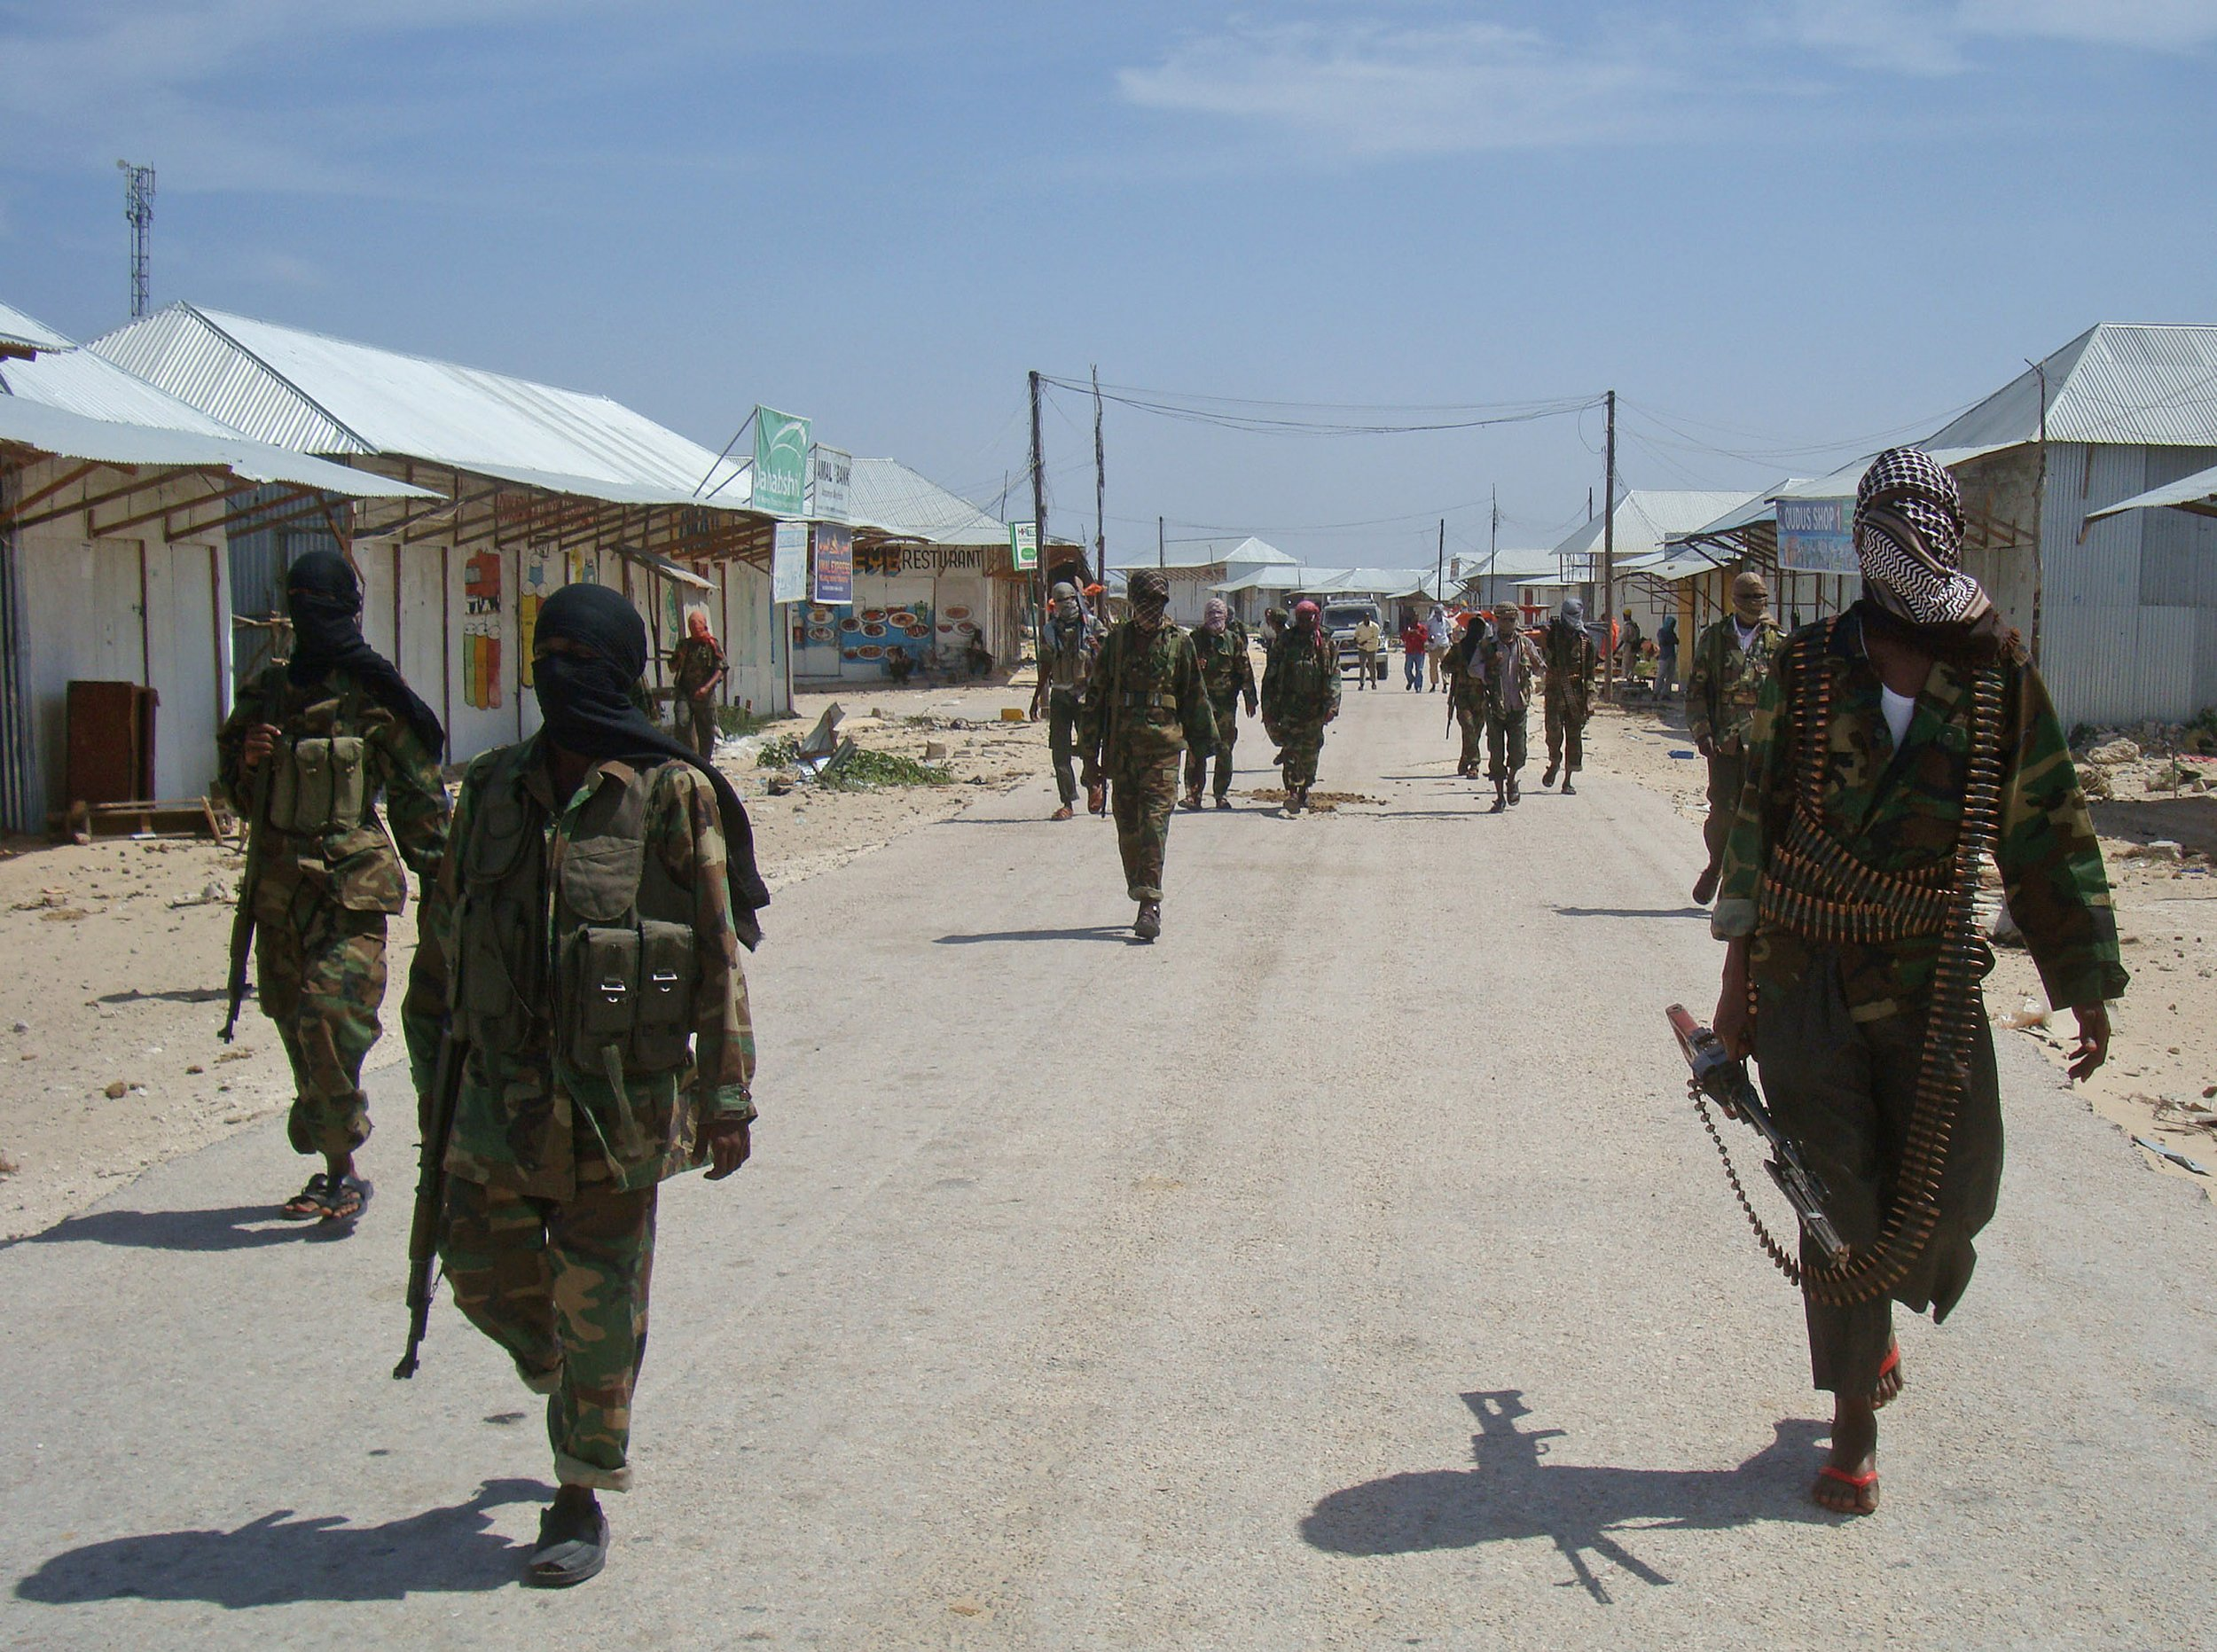 Al-Shabab recruits in Mogadishu